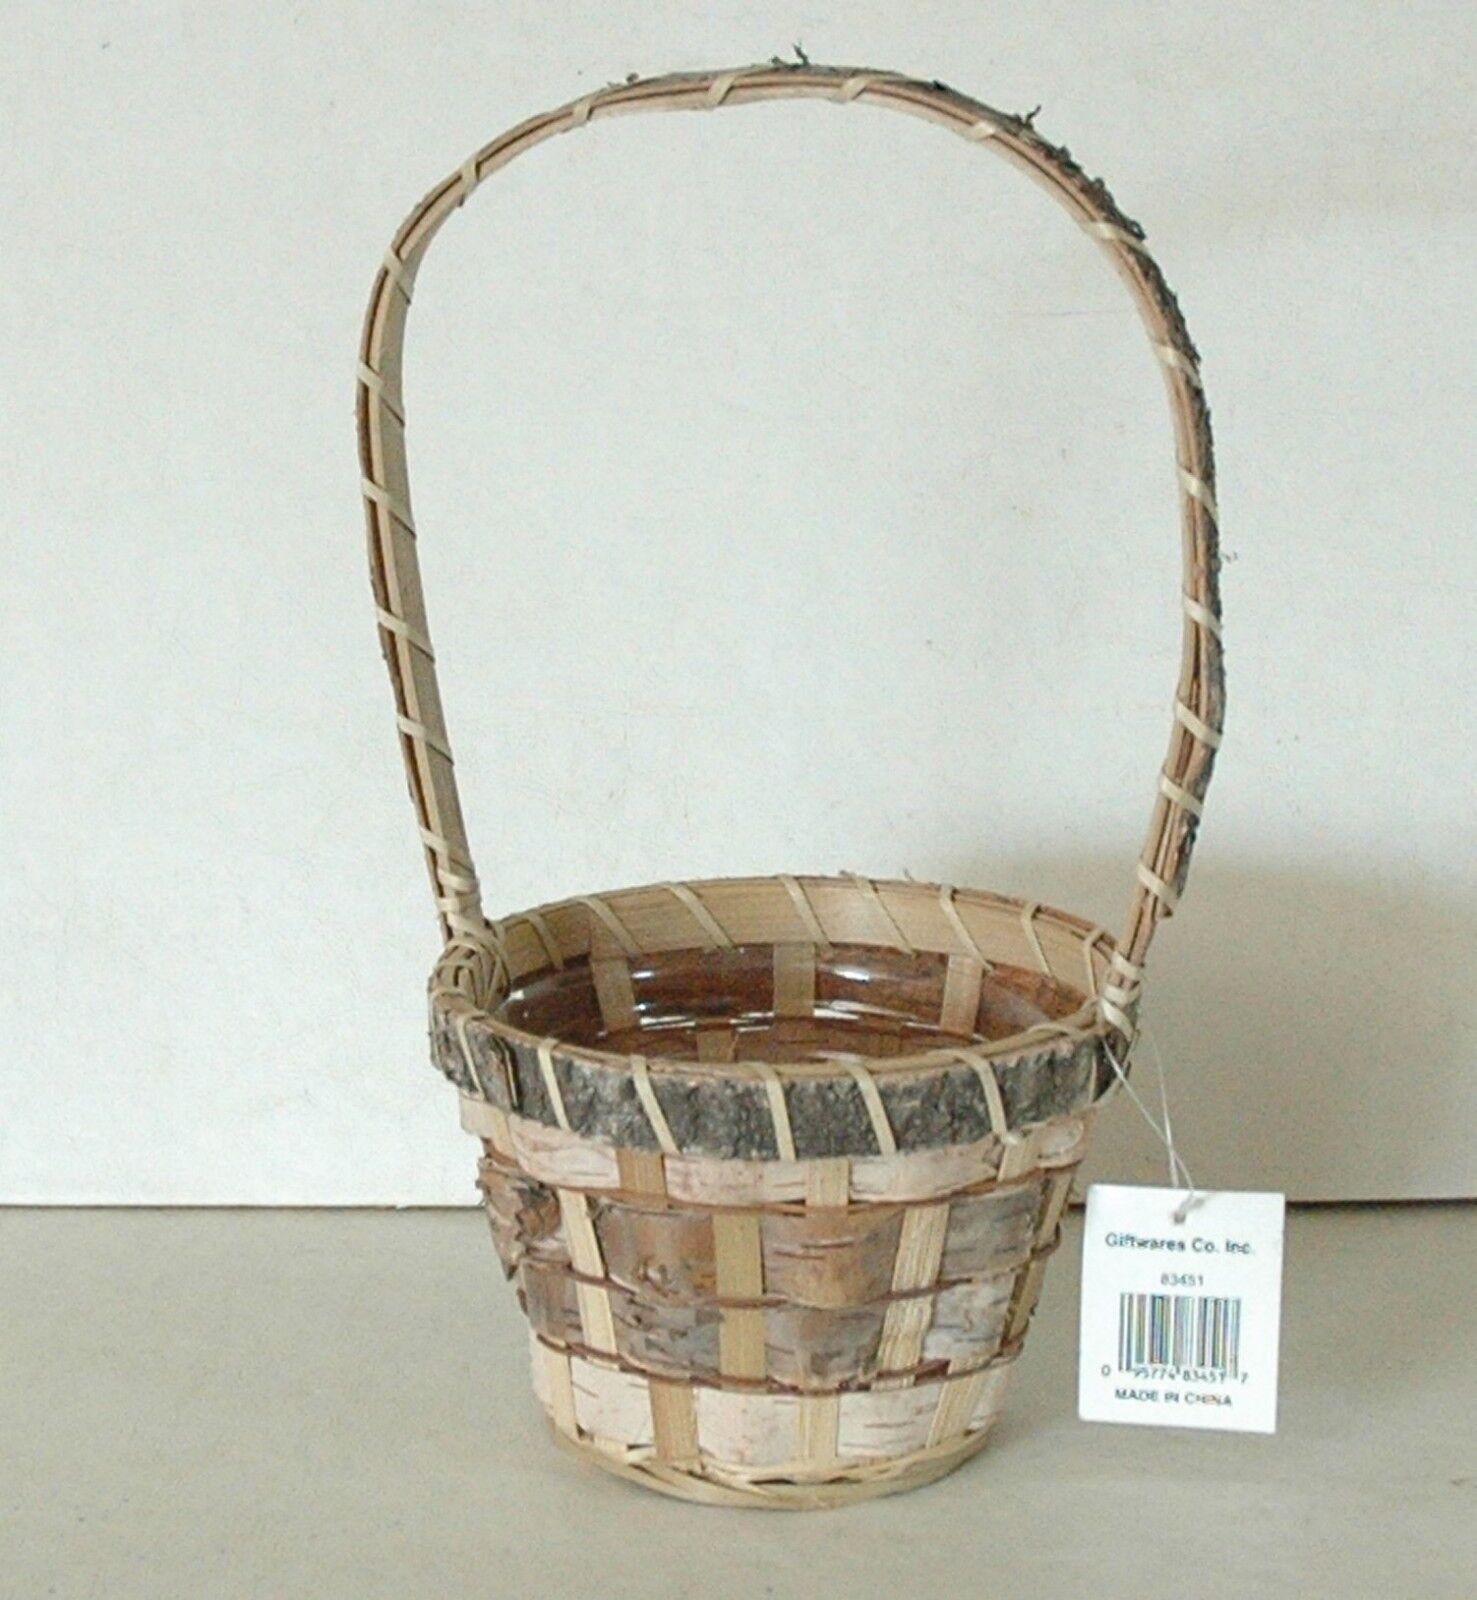 12 Birch Bark Baskets - w Nice Liner -11  High 5  Round Opening - Free Shipping